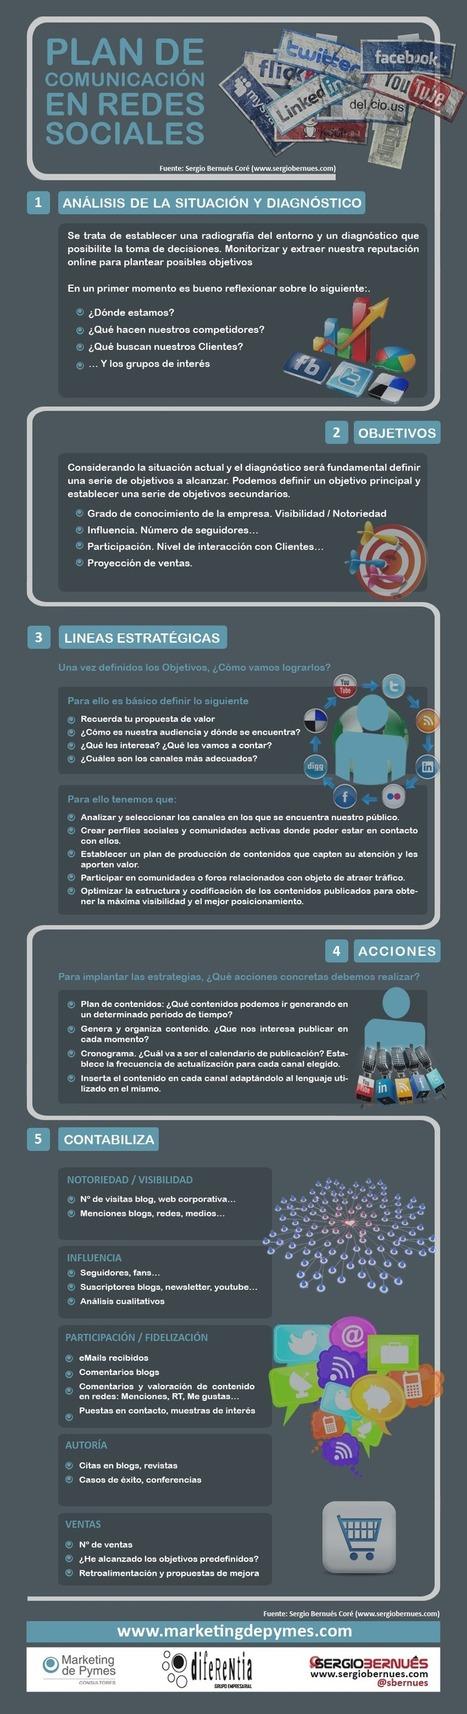 Plan de comunicación en Redes Sociales #infografia #infographic #socialmedia | Cecilia Arrieta Mendizábal | Scoop.it